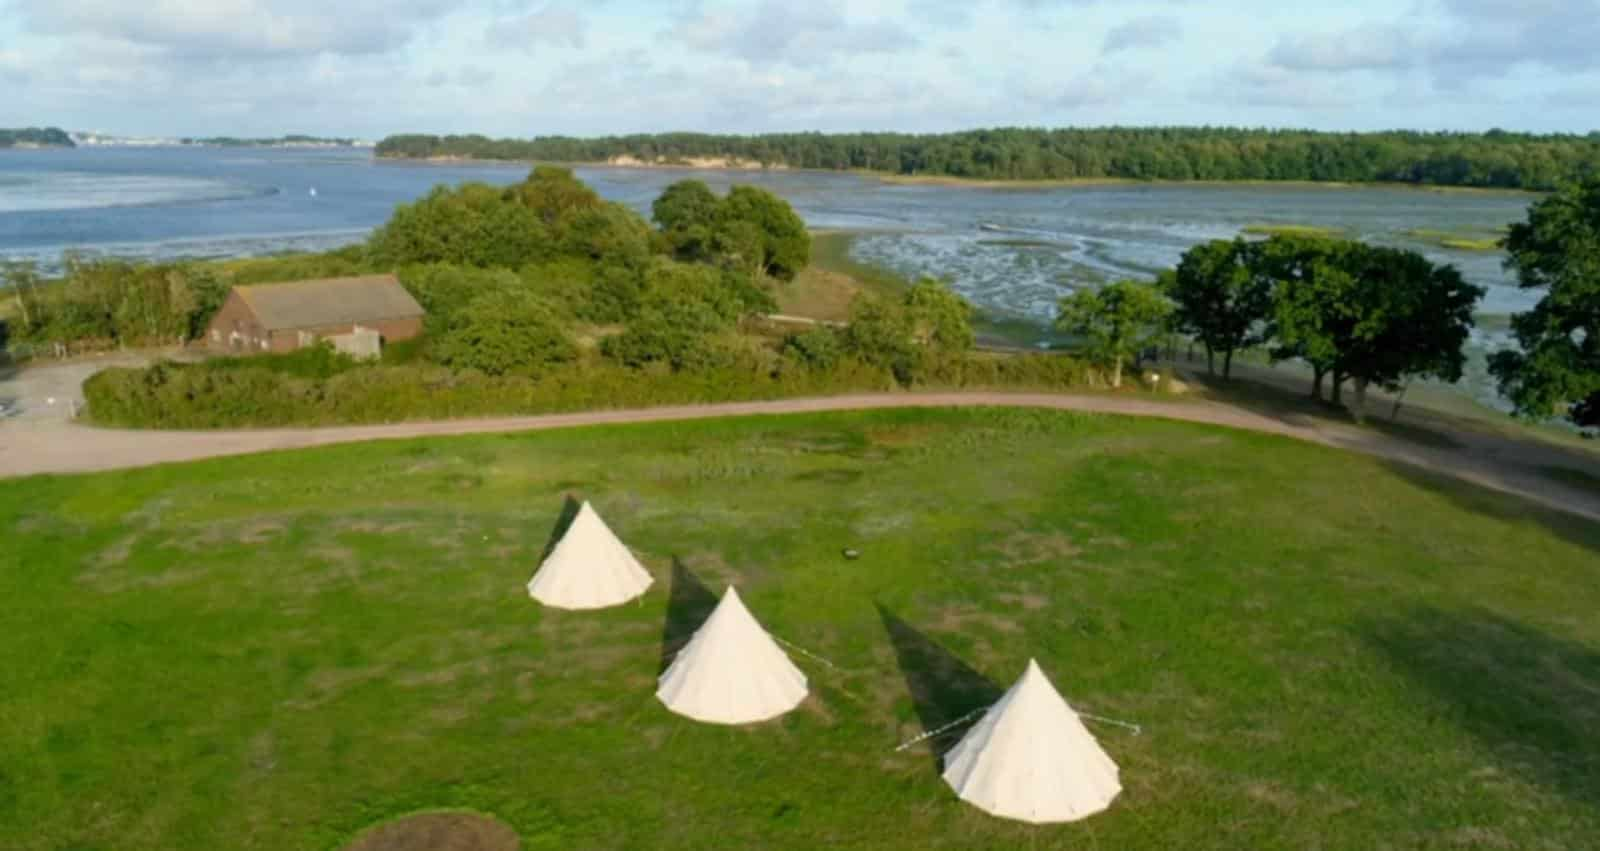 Celebrity 5 Go Camping – Channel 5 filmed at Burnbake Forest Lodges and Campsite